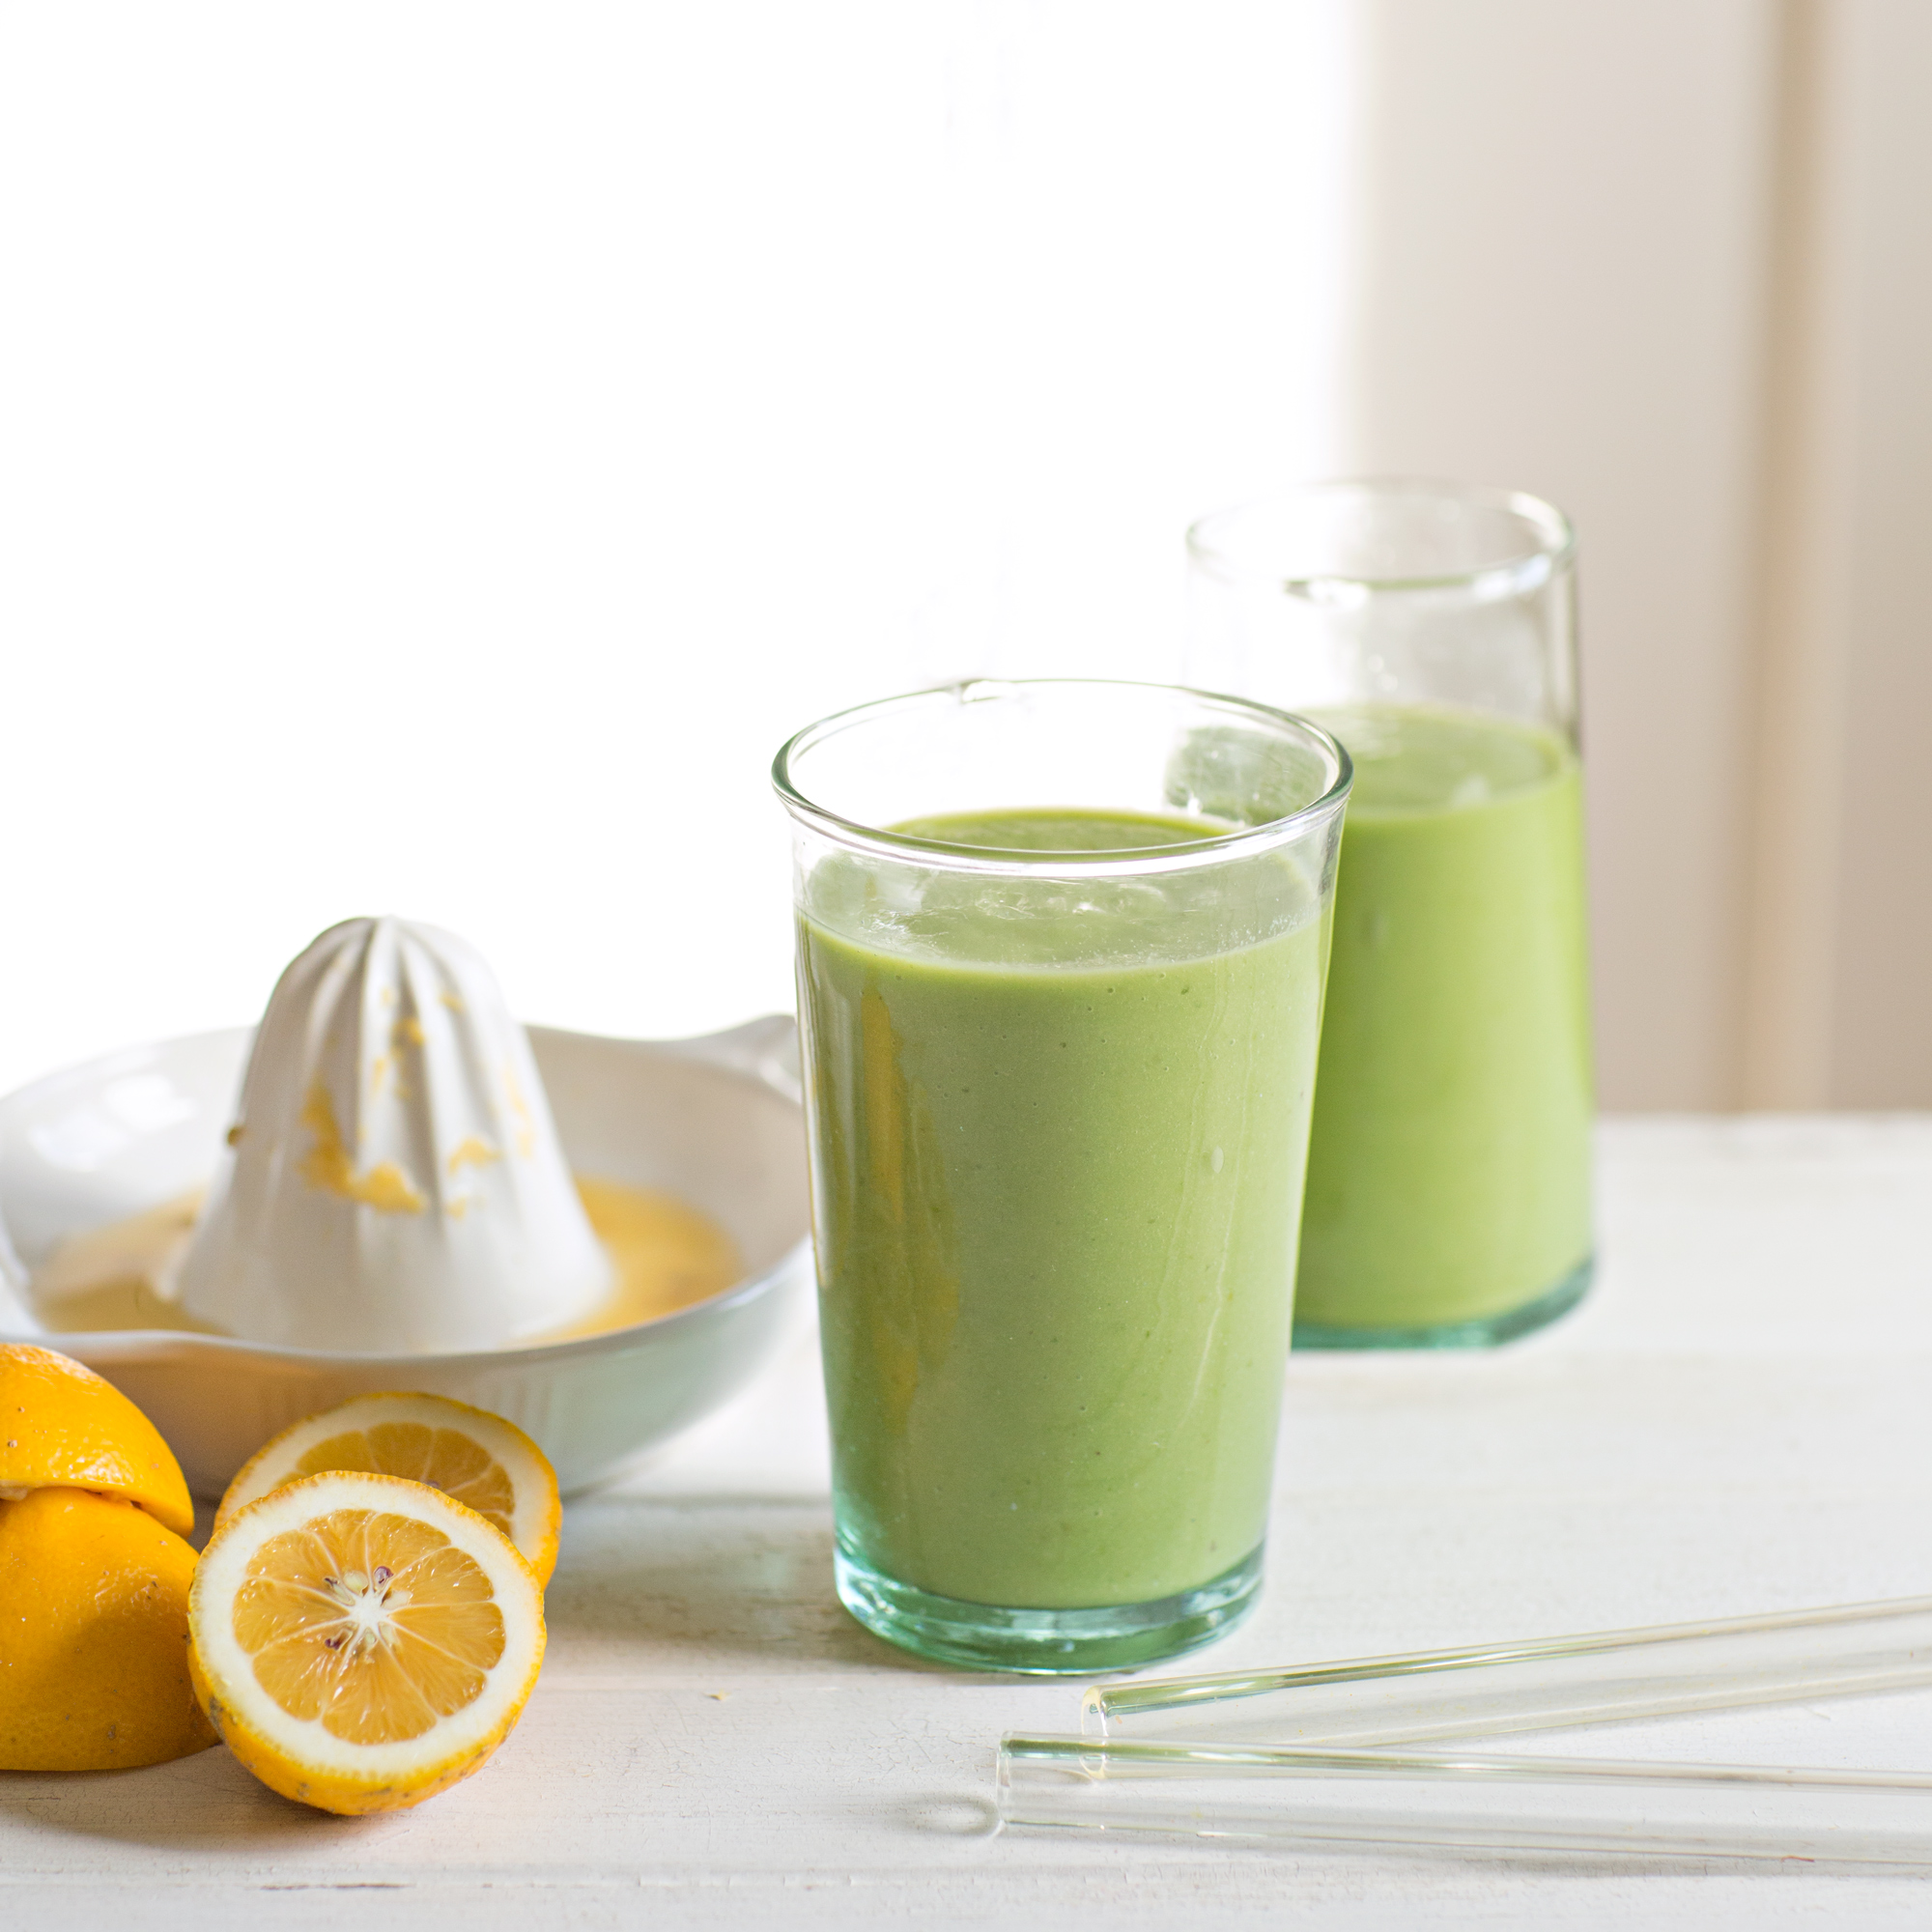 green apple & avo smoothie: the unbakery app